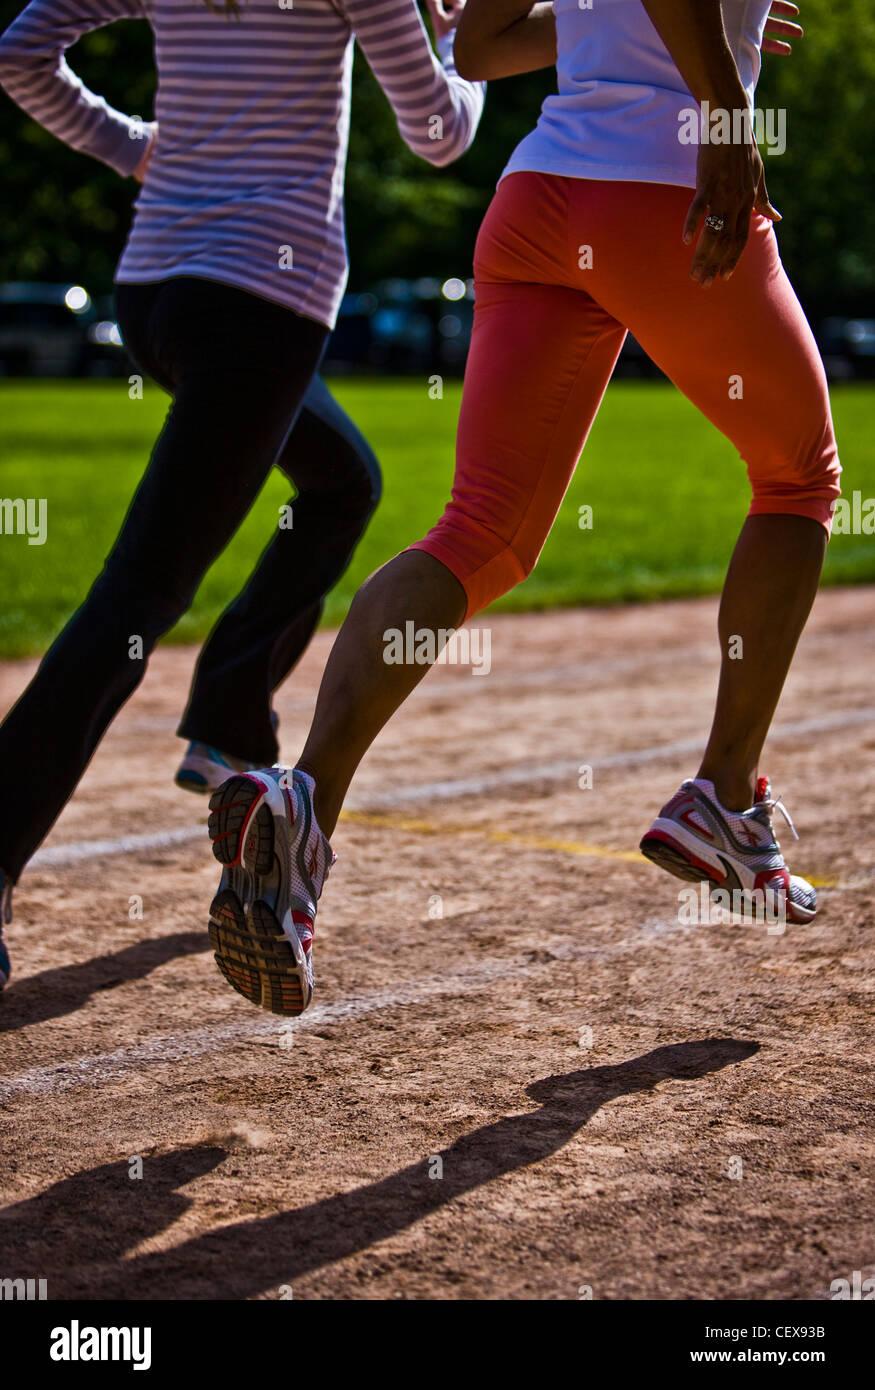 Los corredores de Regent's Park, pista de atletismo Imagen De Stock